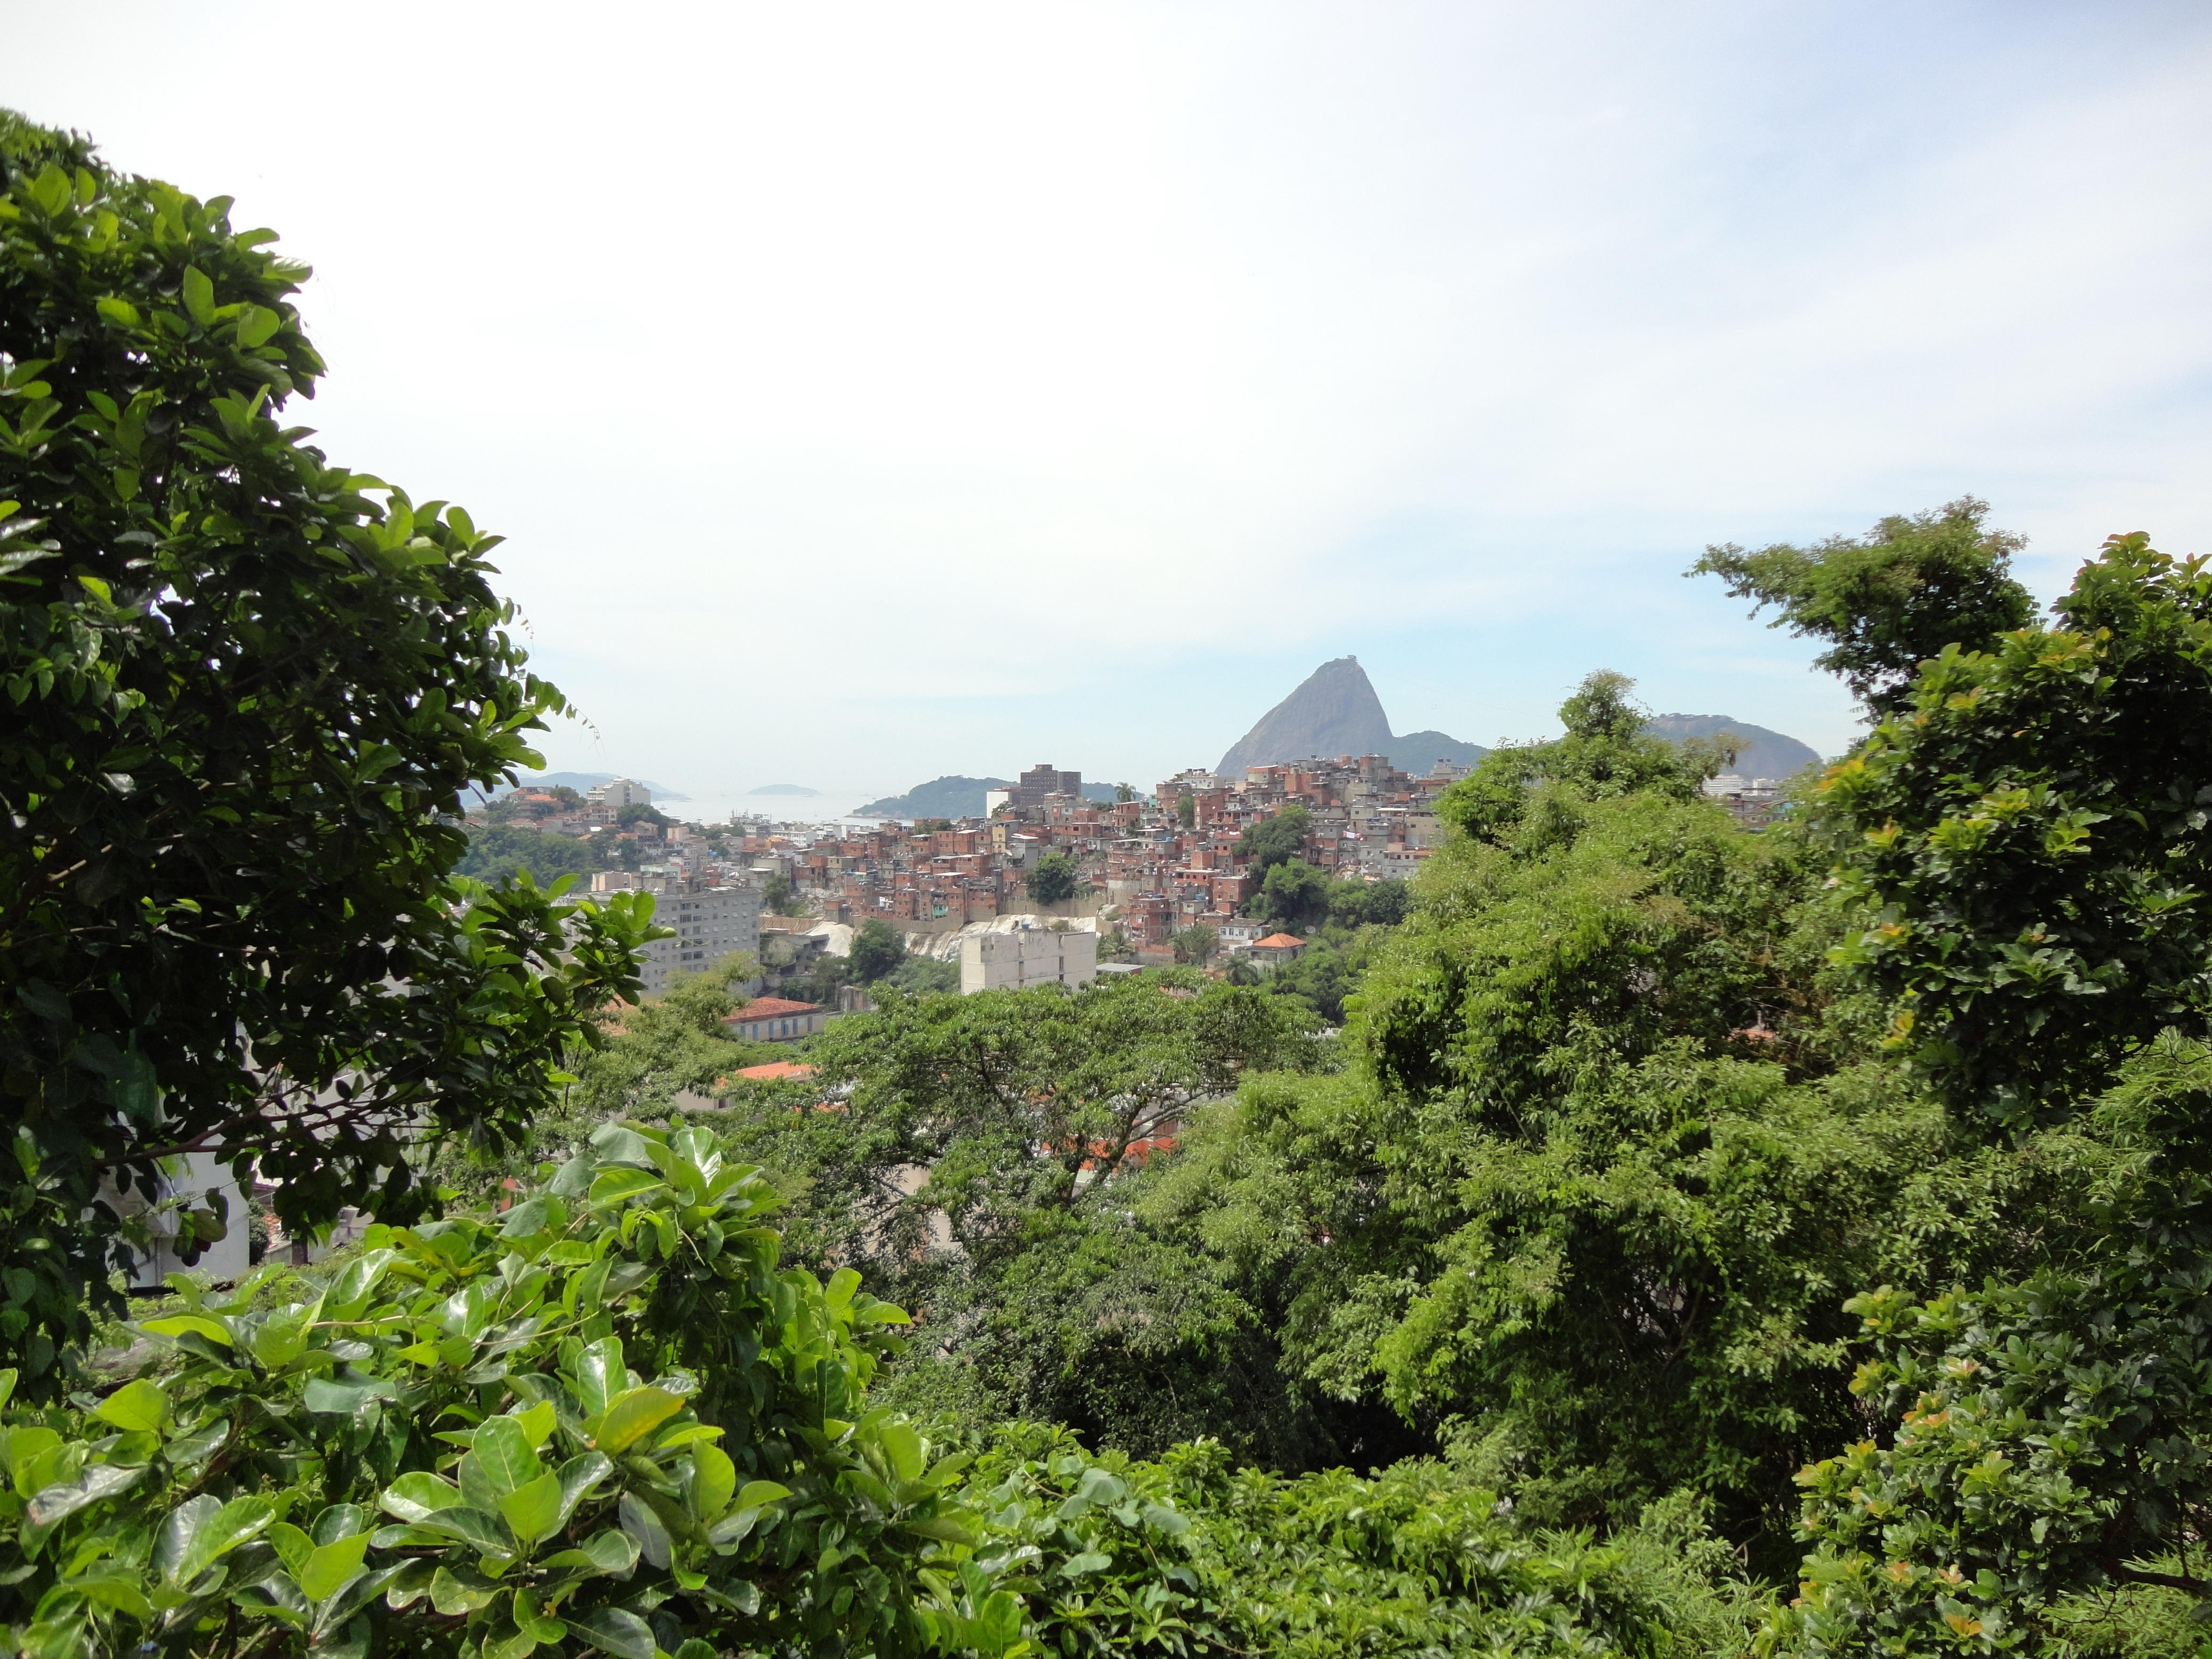 Rio 2013 - Santa Tereza - Carmelitas 035 by GabrielBB